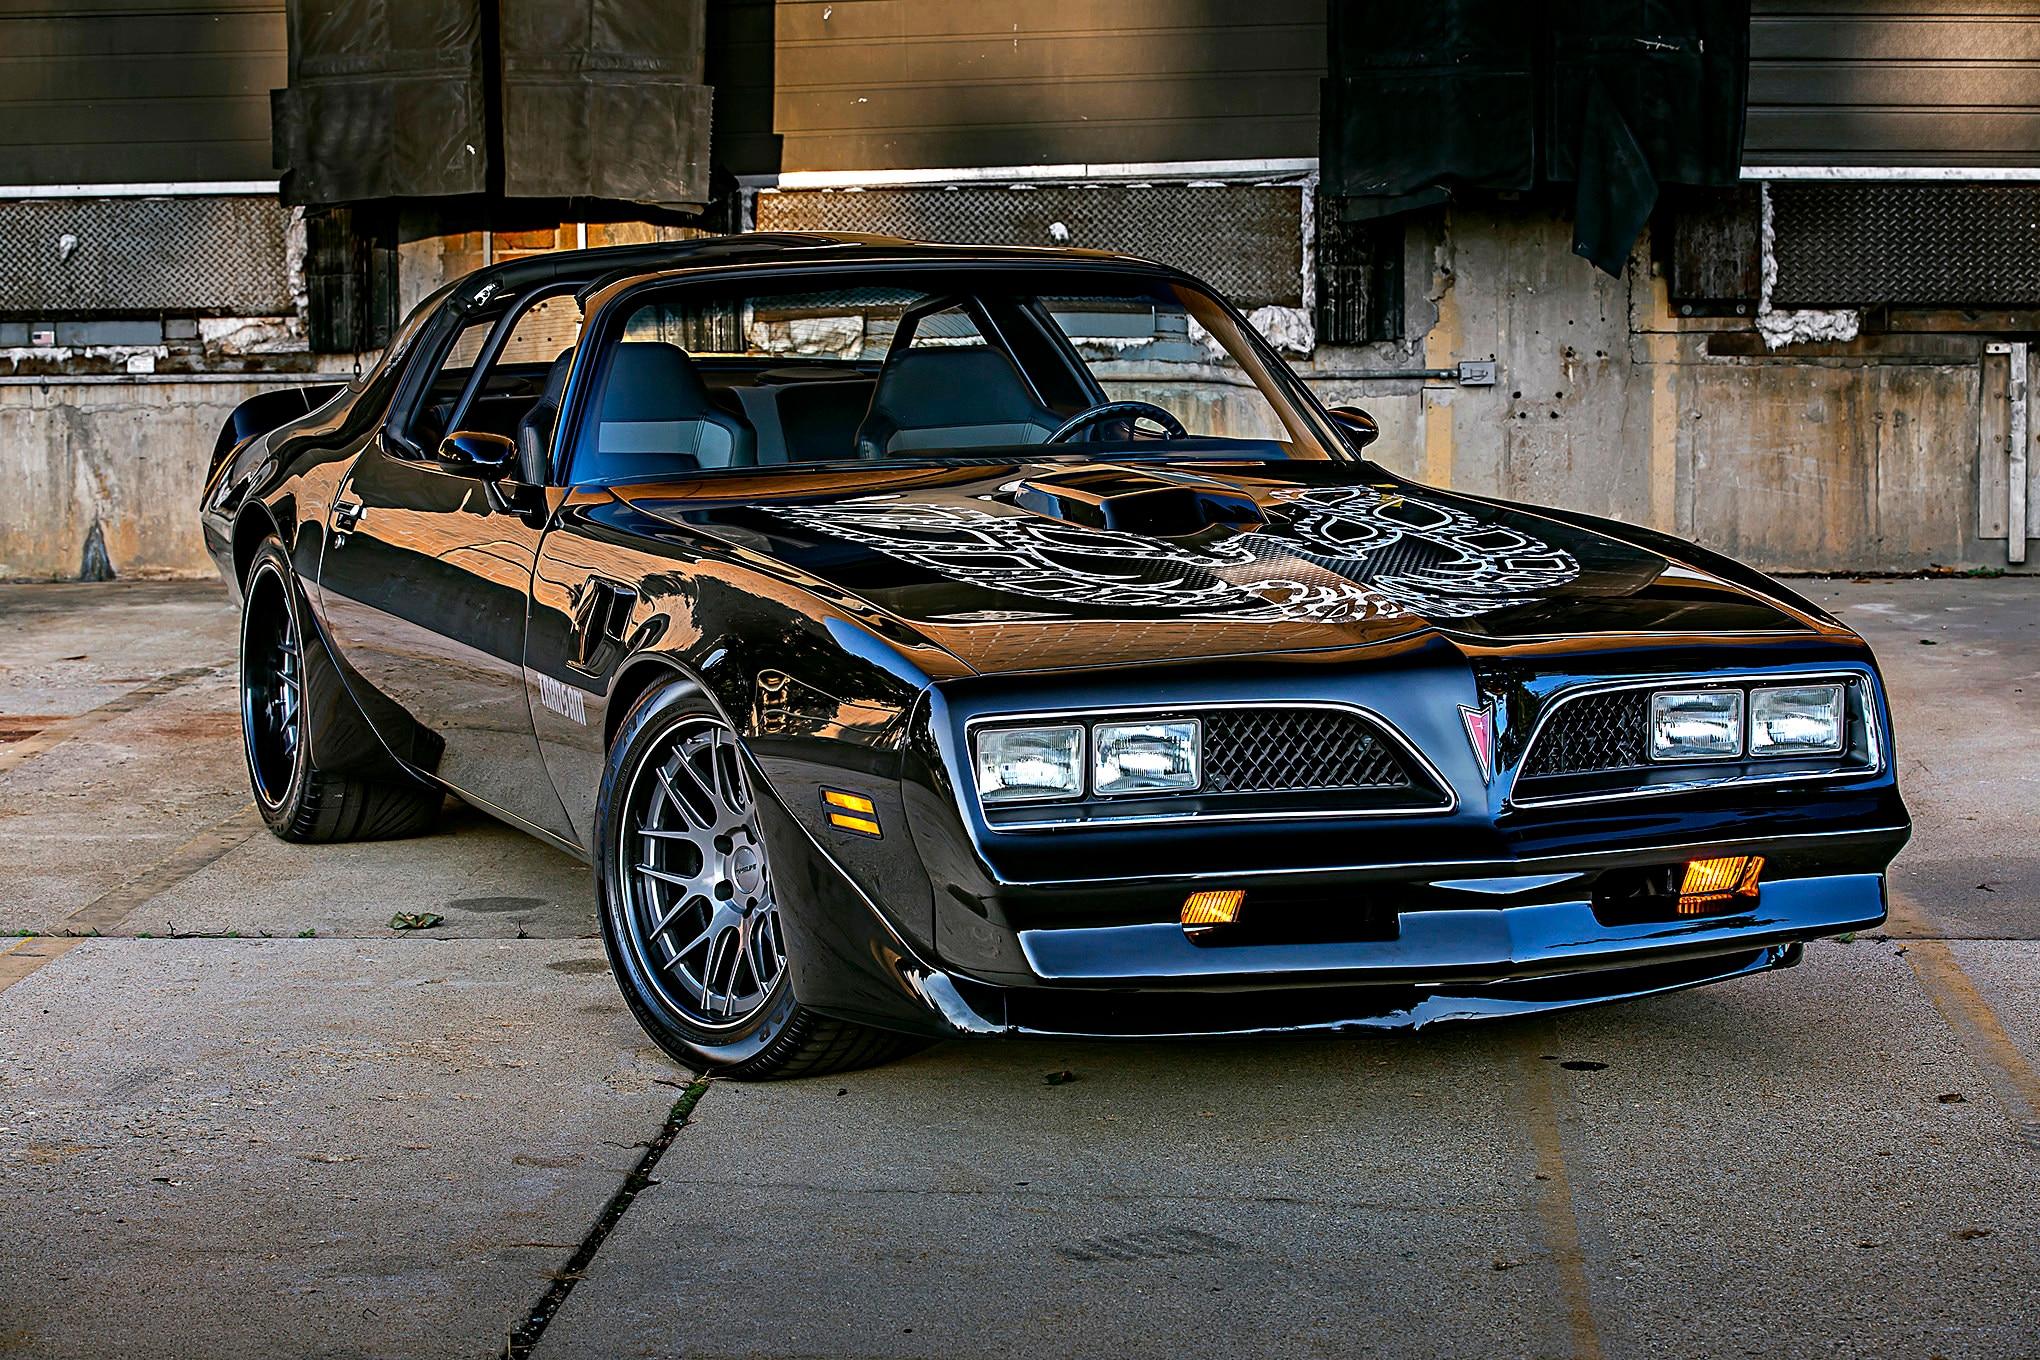 1-056-Tony-Schumacher-1977-Pontiac-Trans-Am.jpg